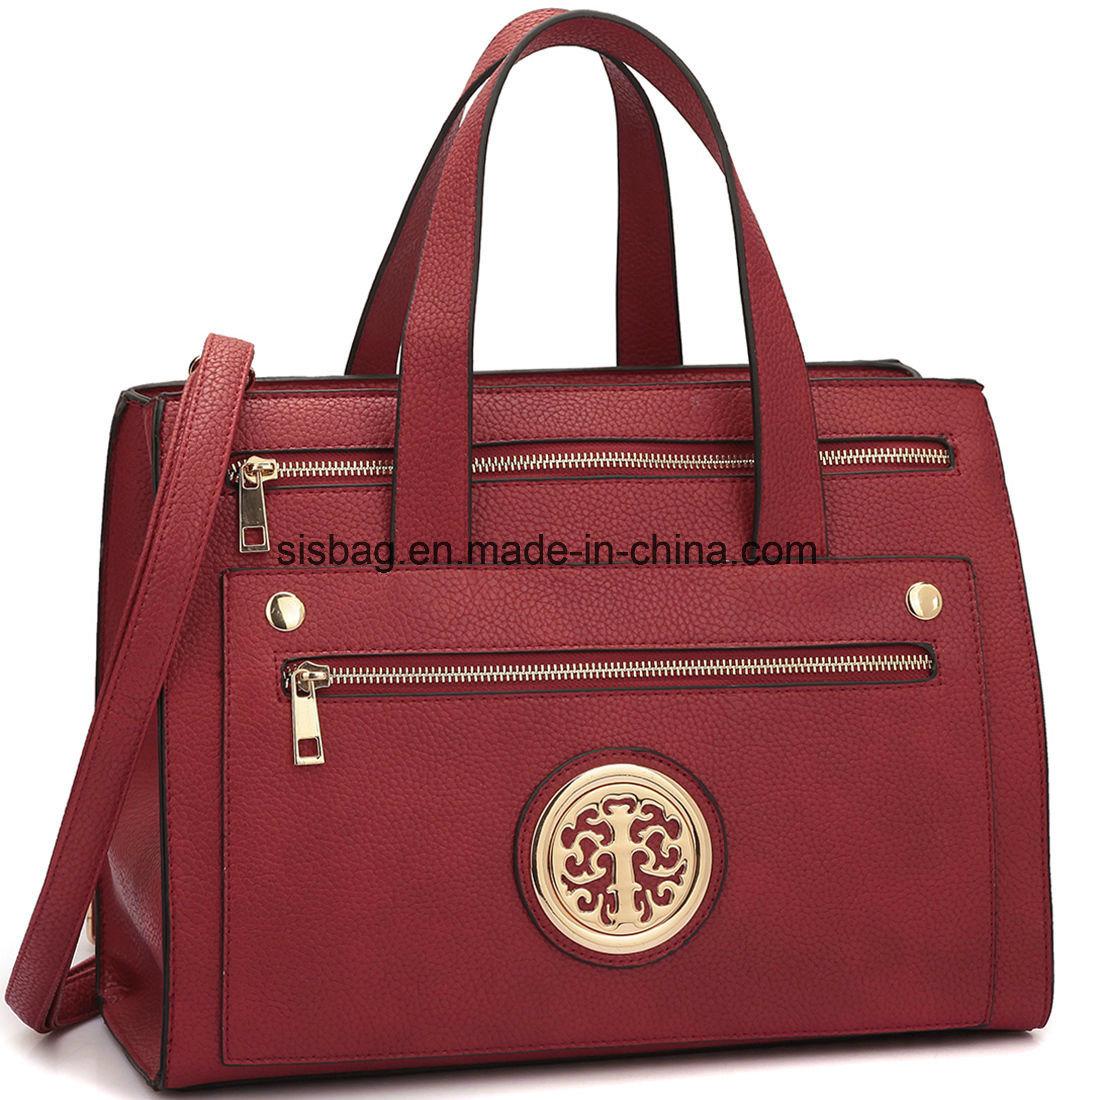 Designer Litchi Grain PU Leather Women Handbag Messeger Bag